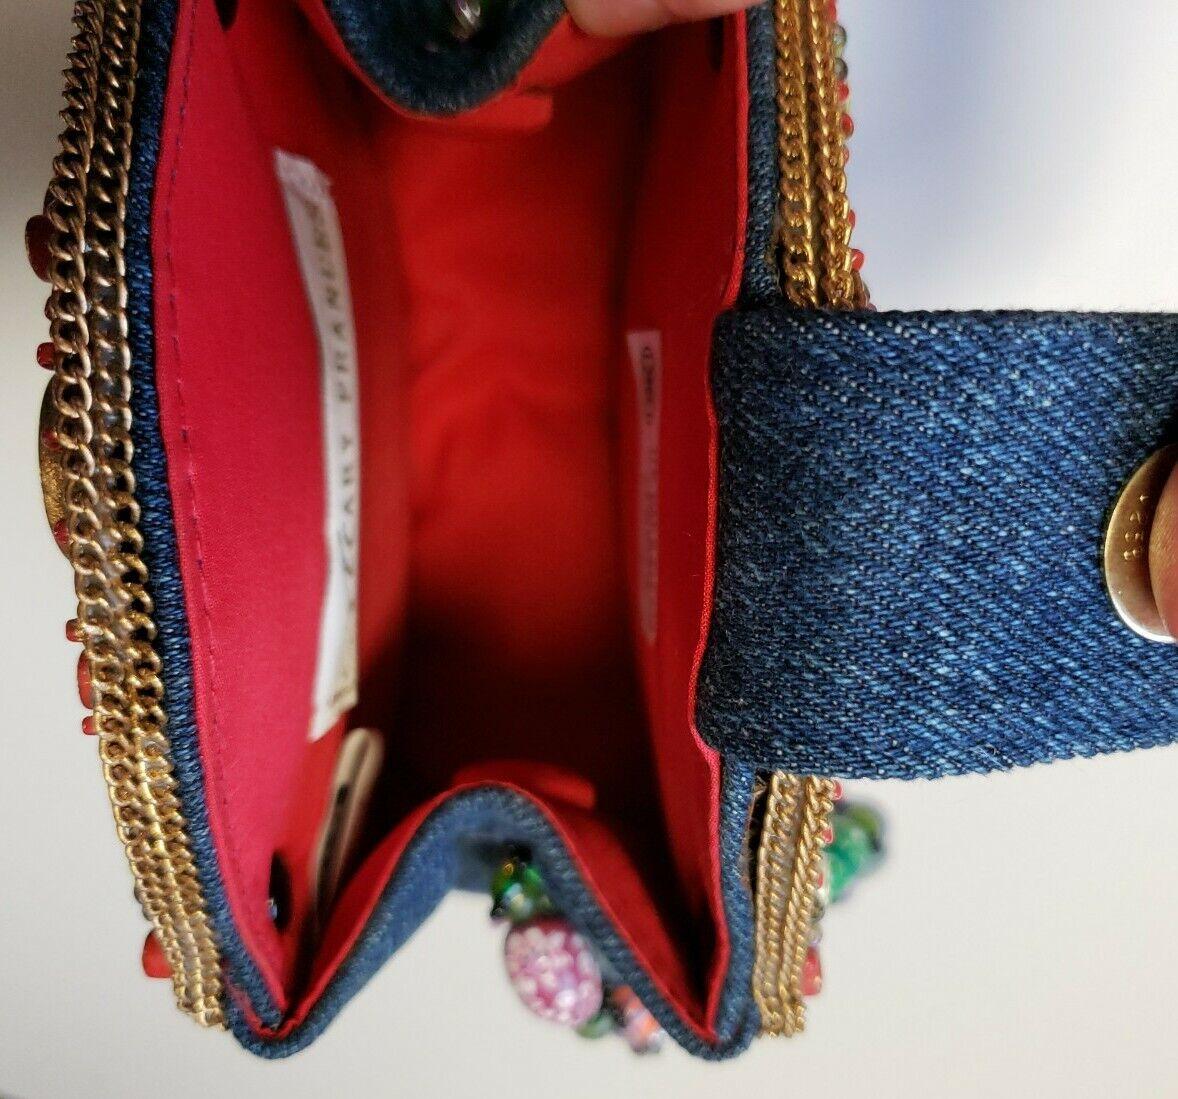 Mary Frances Butterfly Purse Handbag - image 7